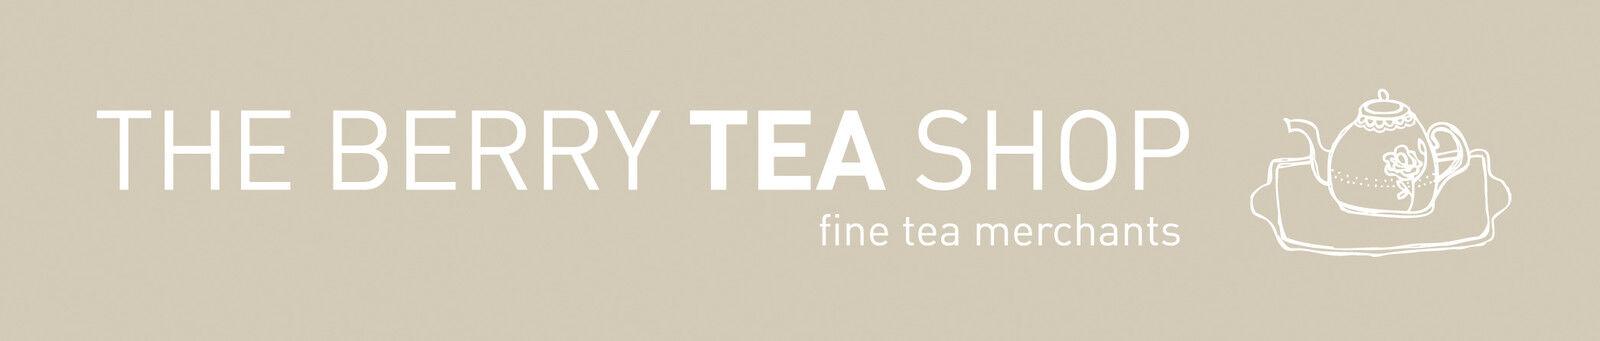 The Berry Tea Shop